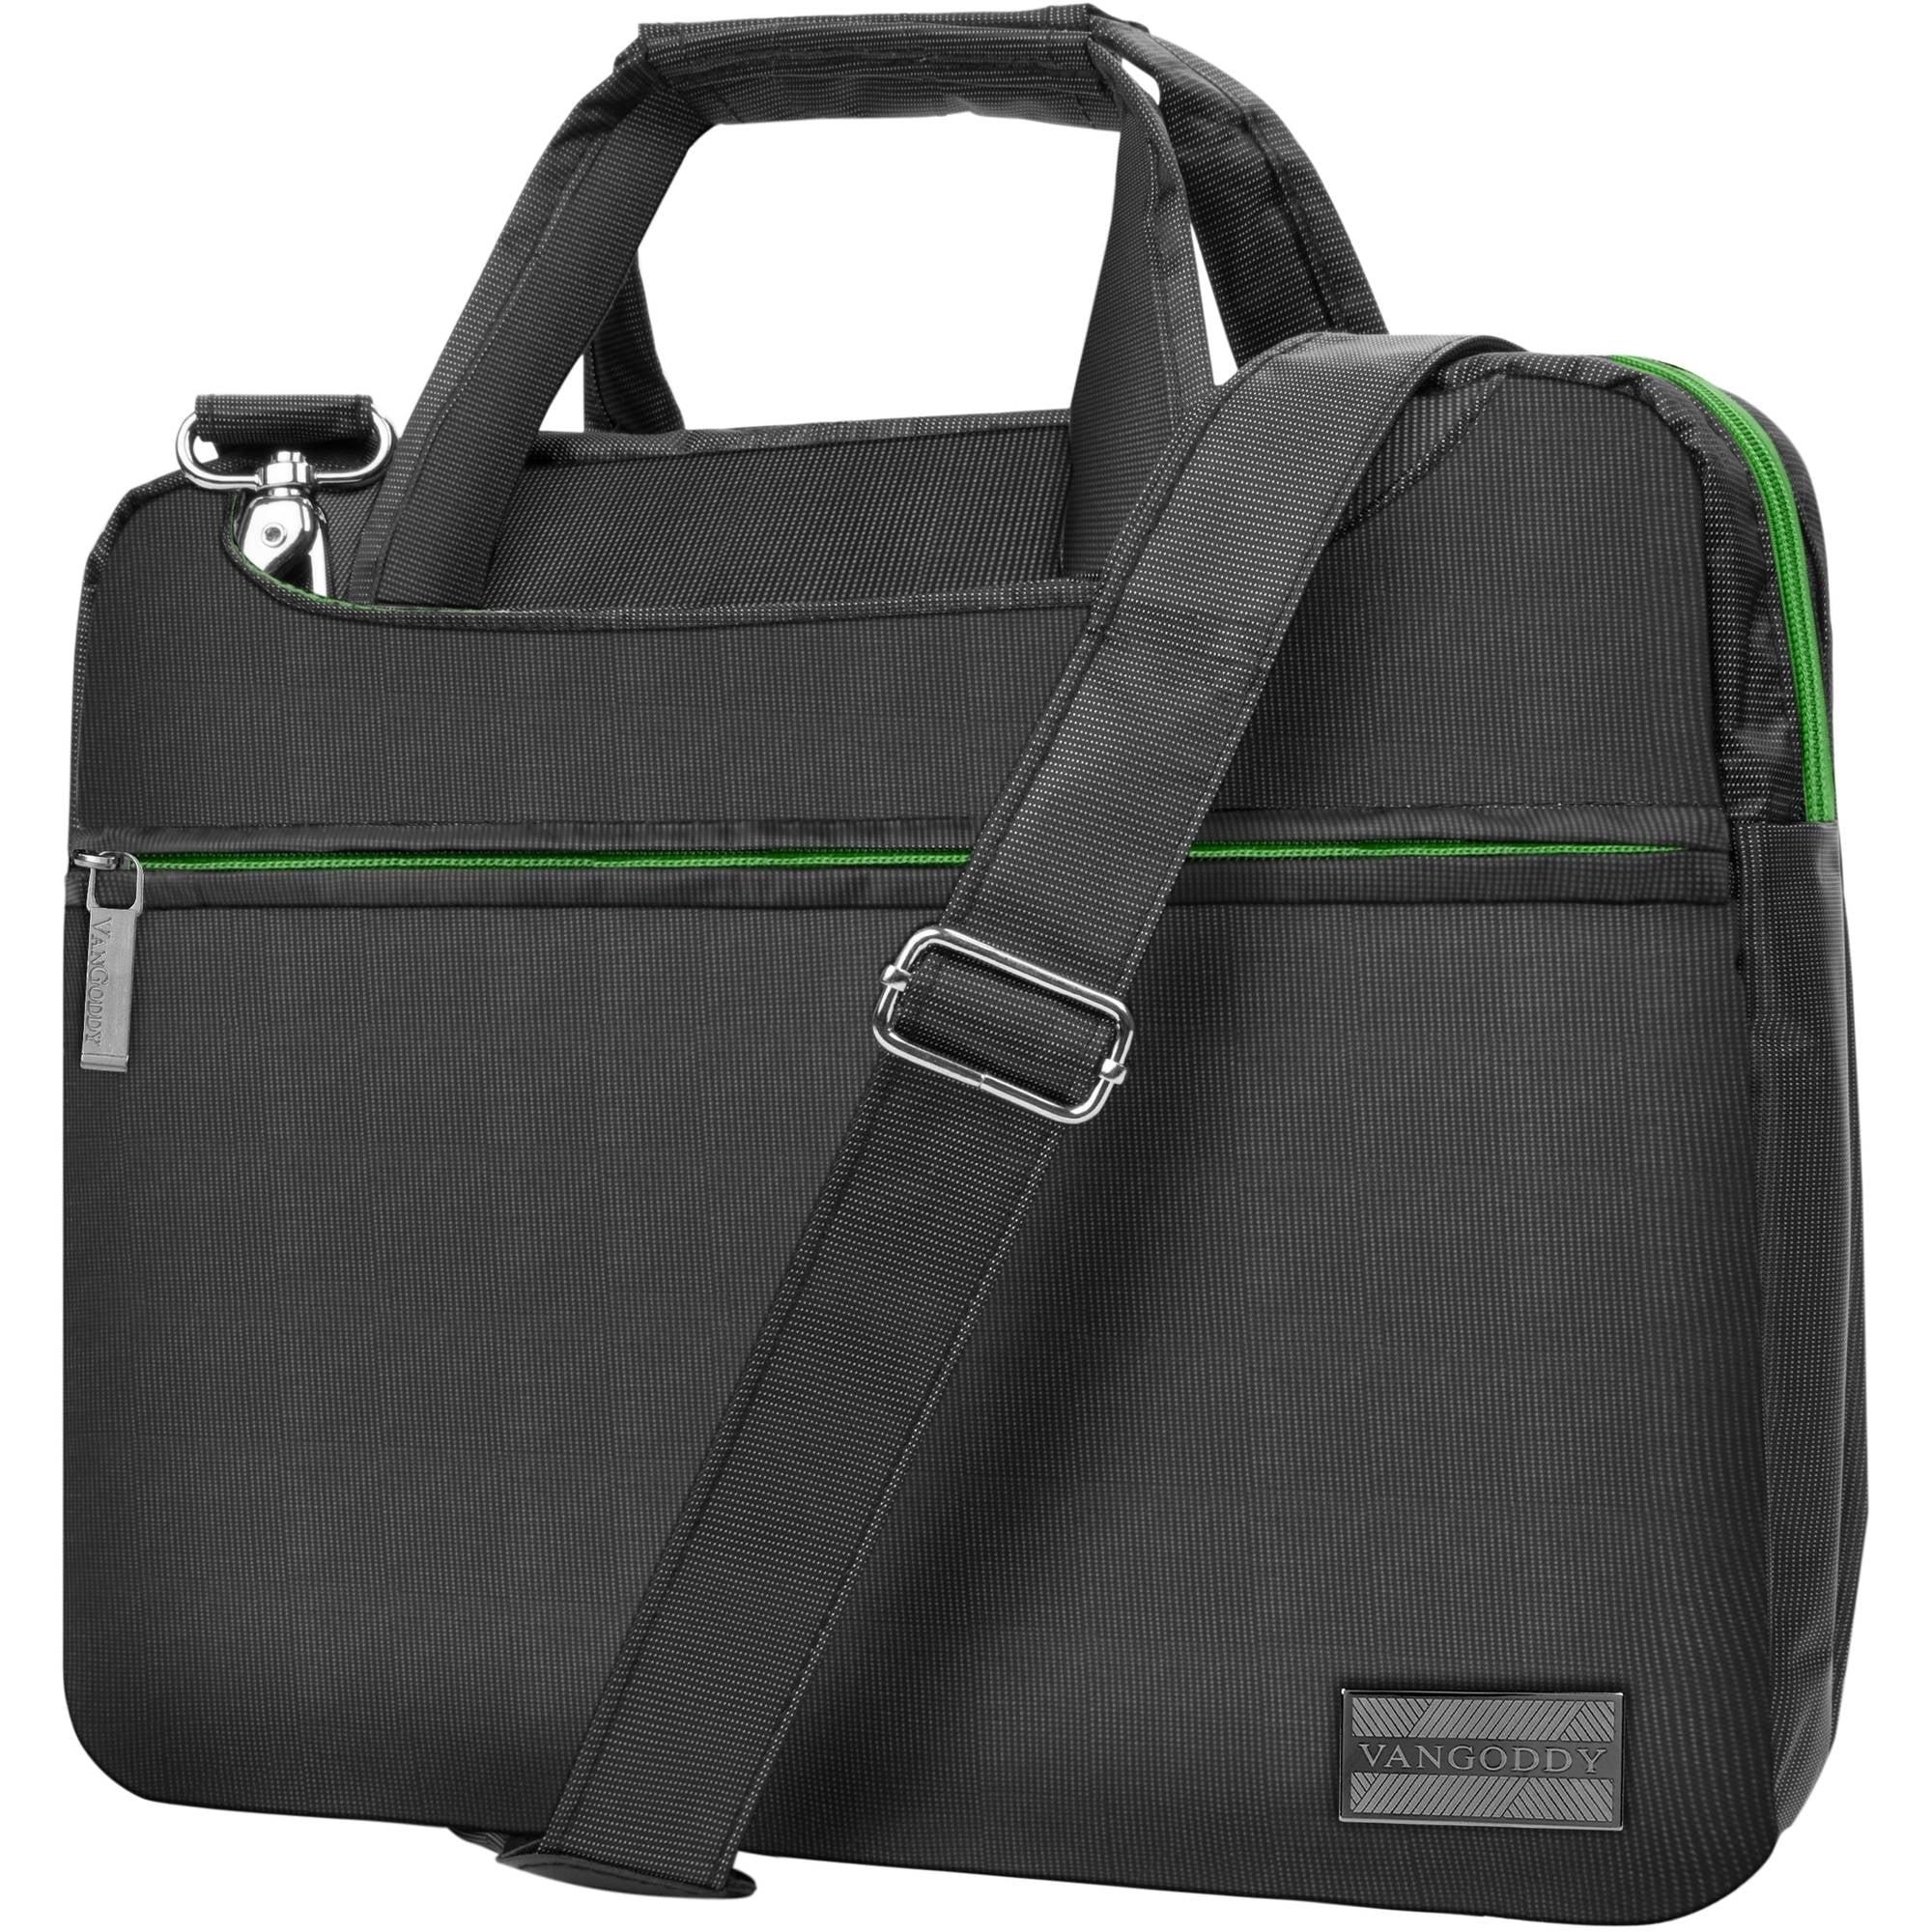 VANGODDY NineO Shoulder Messenger Laptop Case / Notebook Case fits Laptops up to 12.1, 13, 13.3 inches